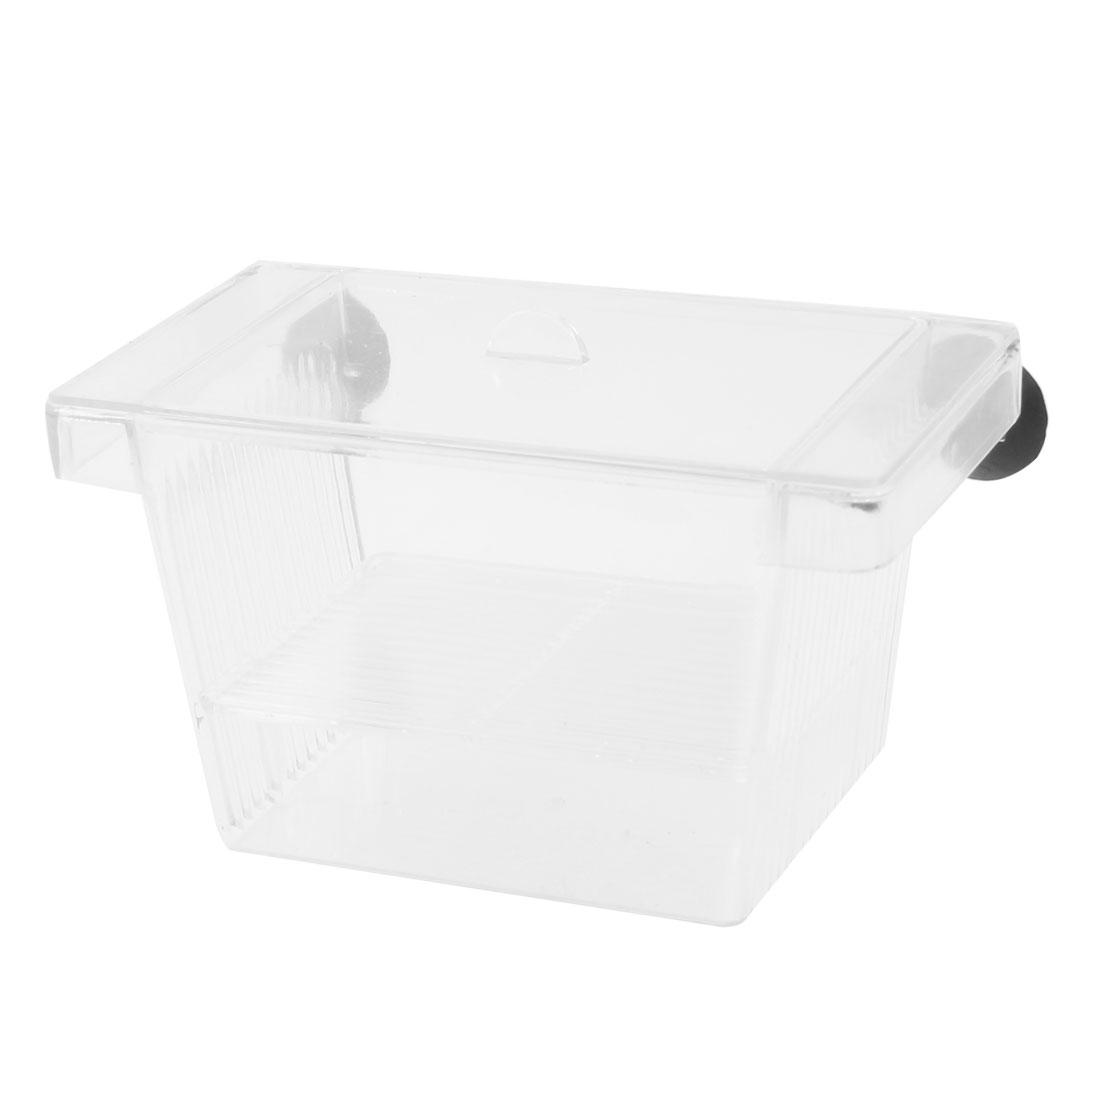 Aquarium Clear Plastic 2 Layers Fish Spawn Hatchery Breeder Separation Tank Box